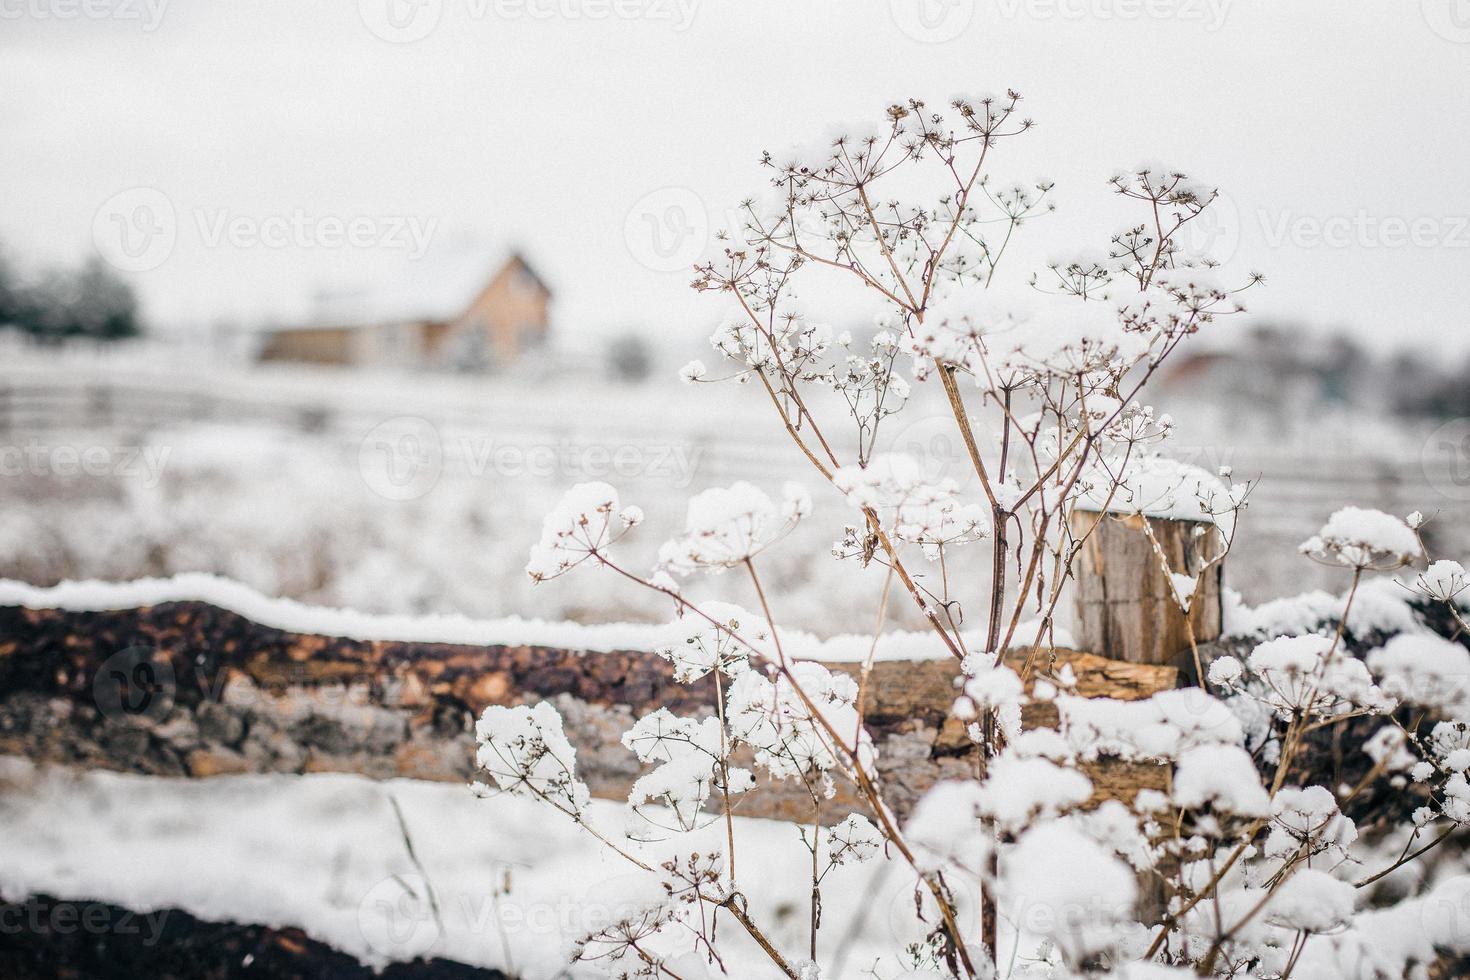 Winter in a village photo